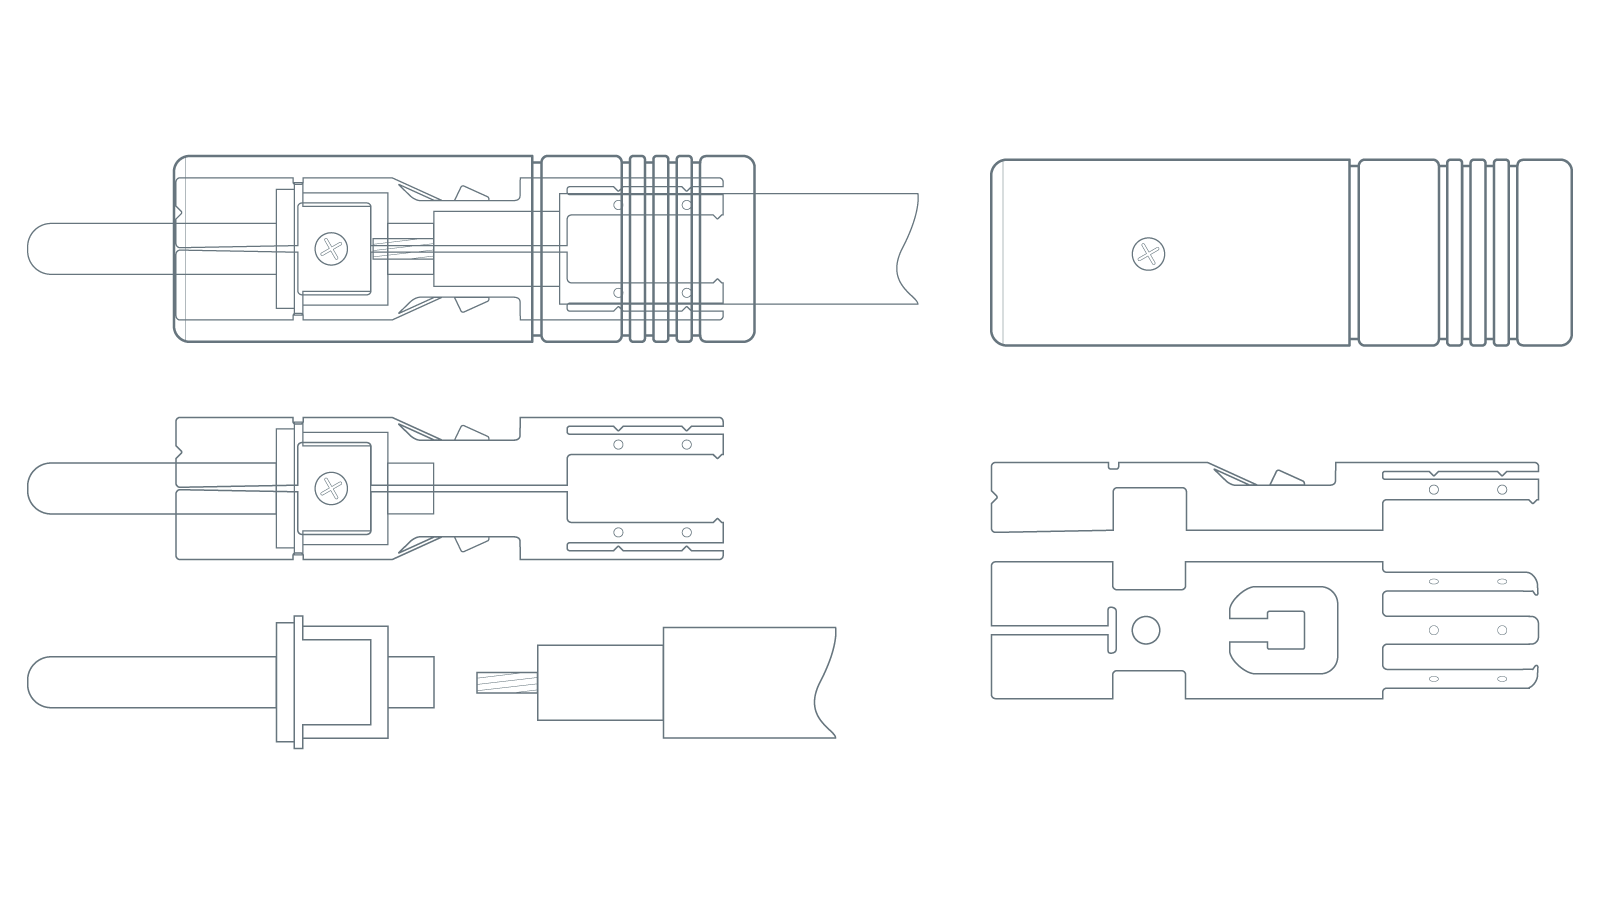 integra assembly